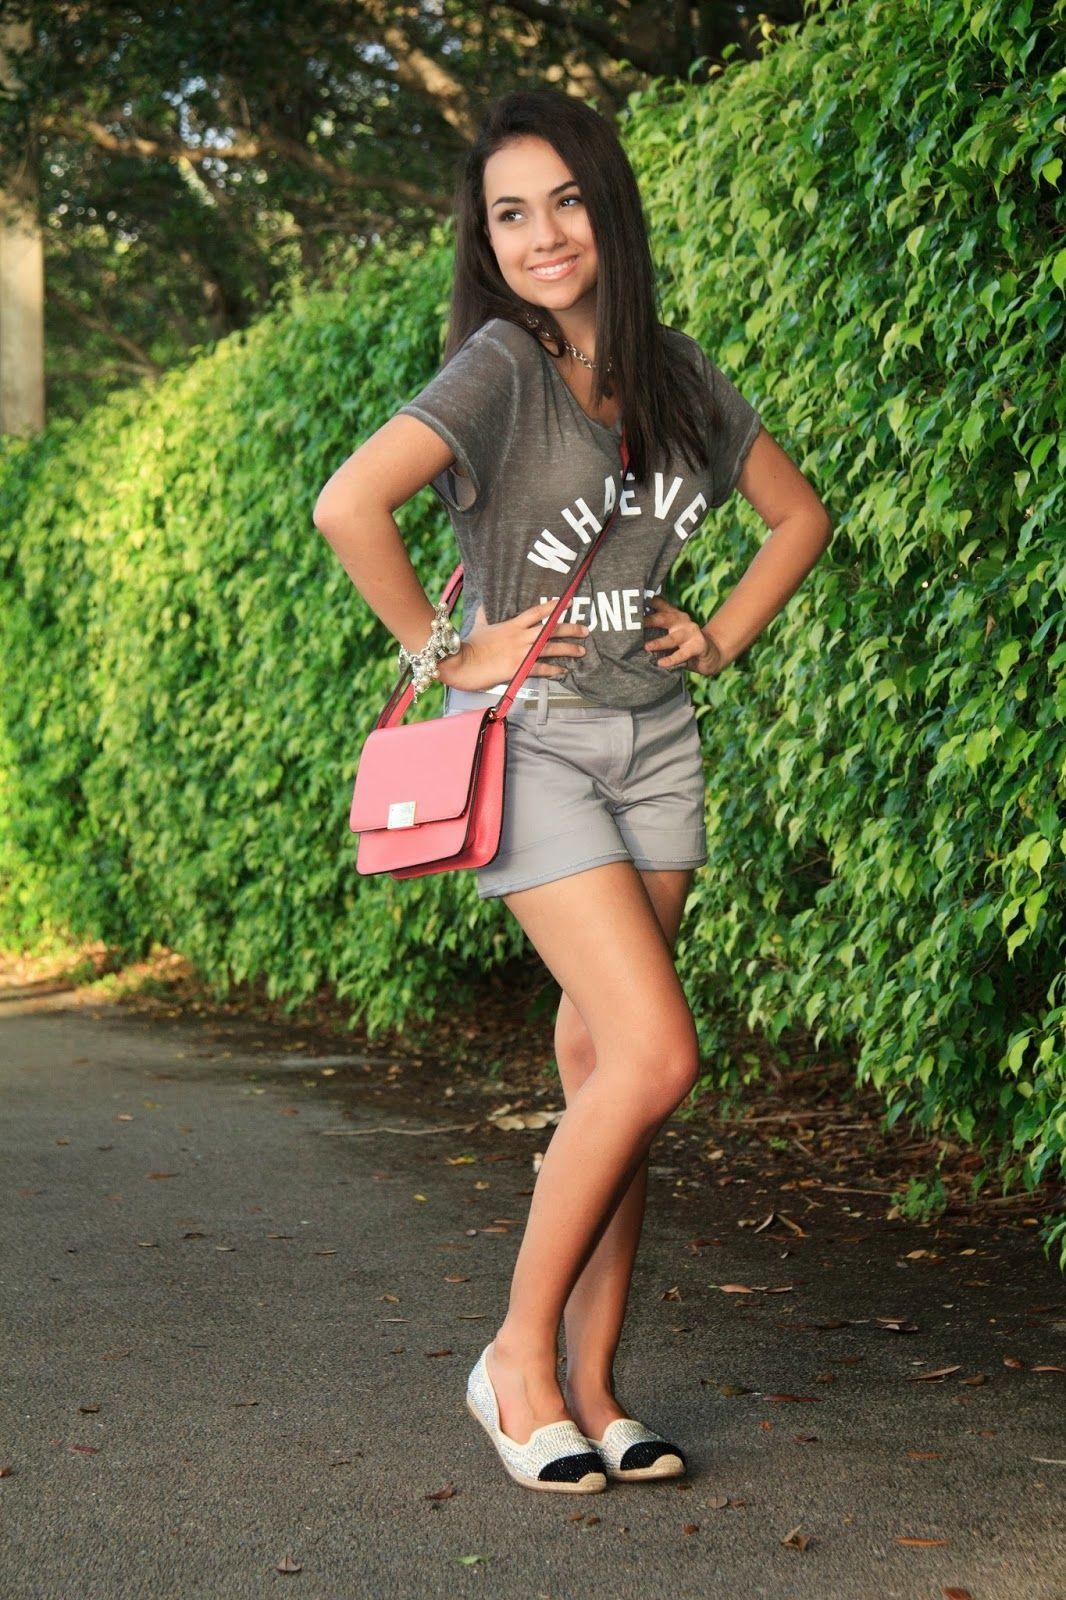 @express outfit. college. street style #Expressrunway #LoveExpress summer, graphic tee @stylishlyinlove  stylishlyinlove.blogspot.com